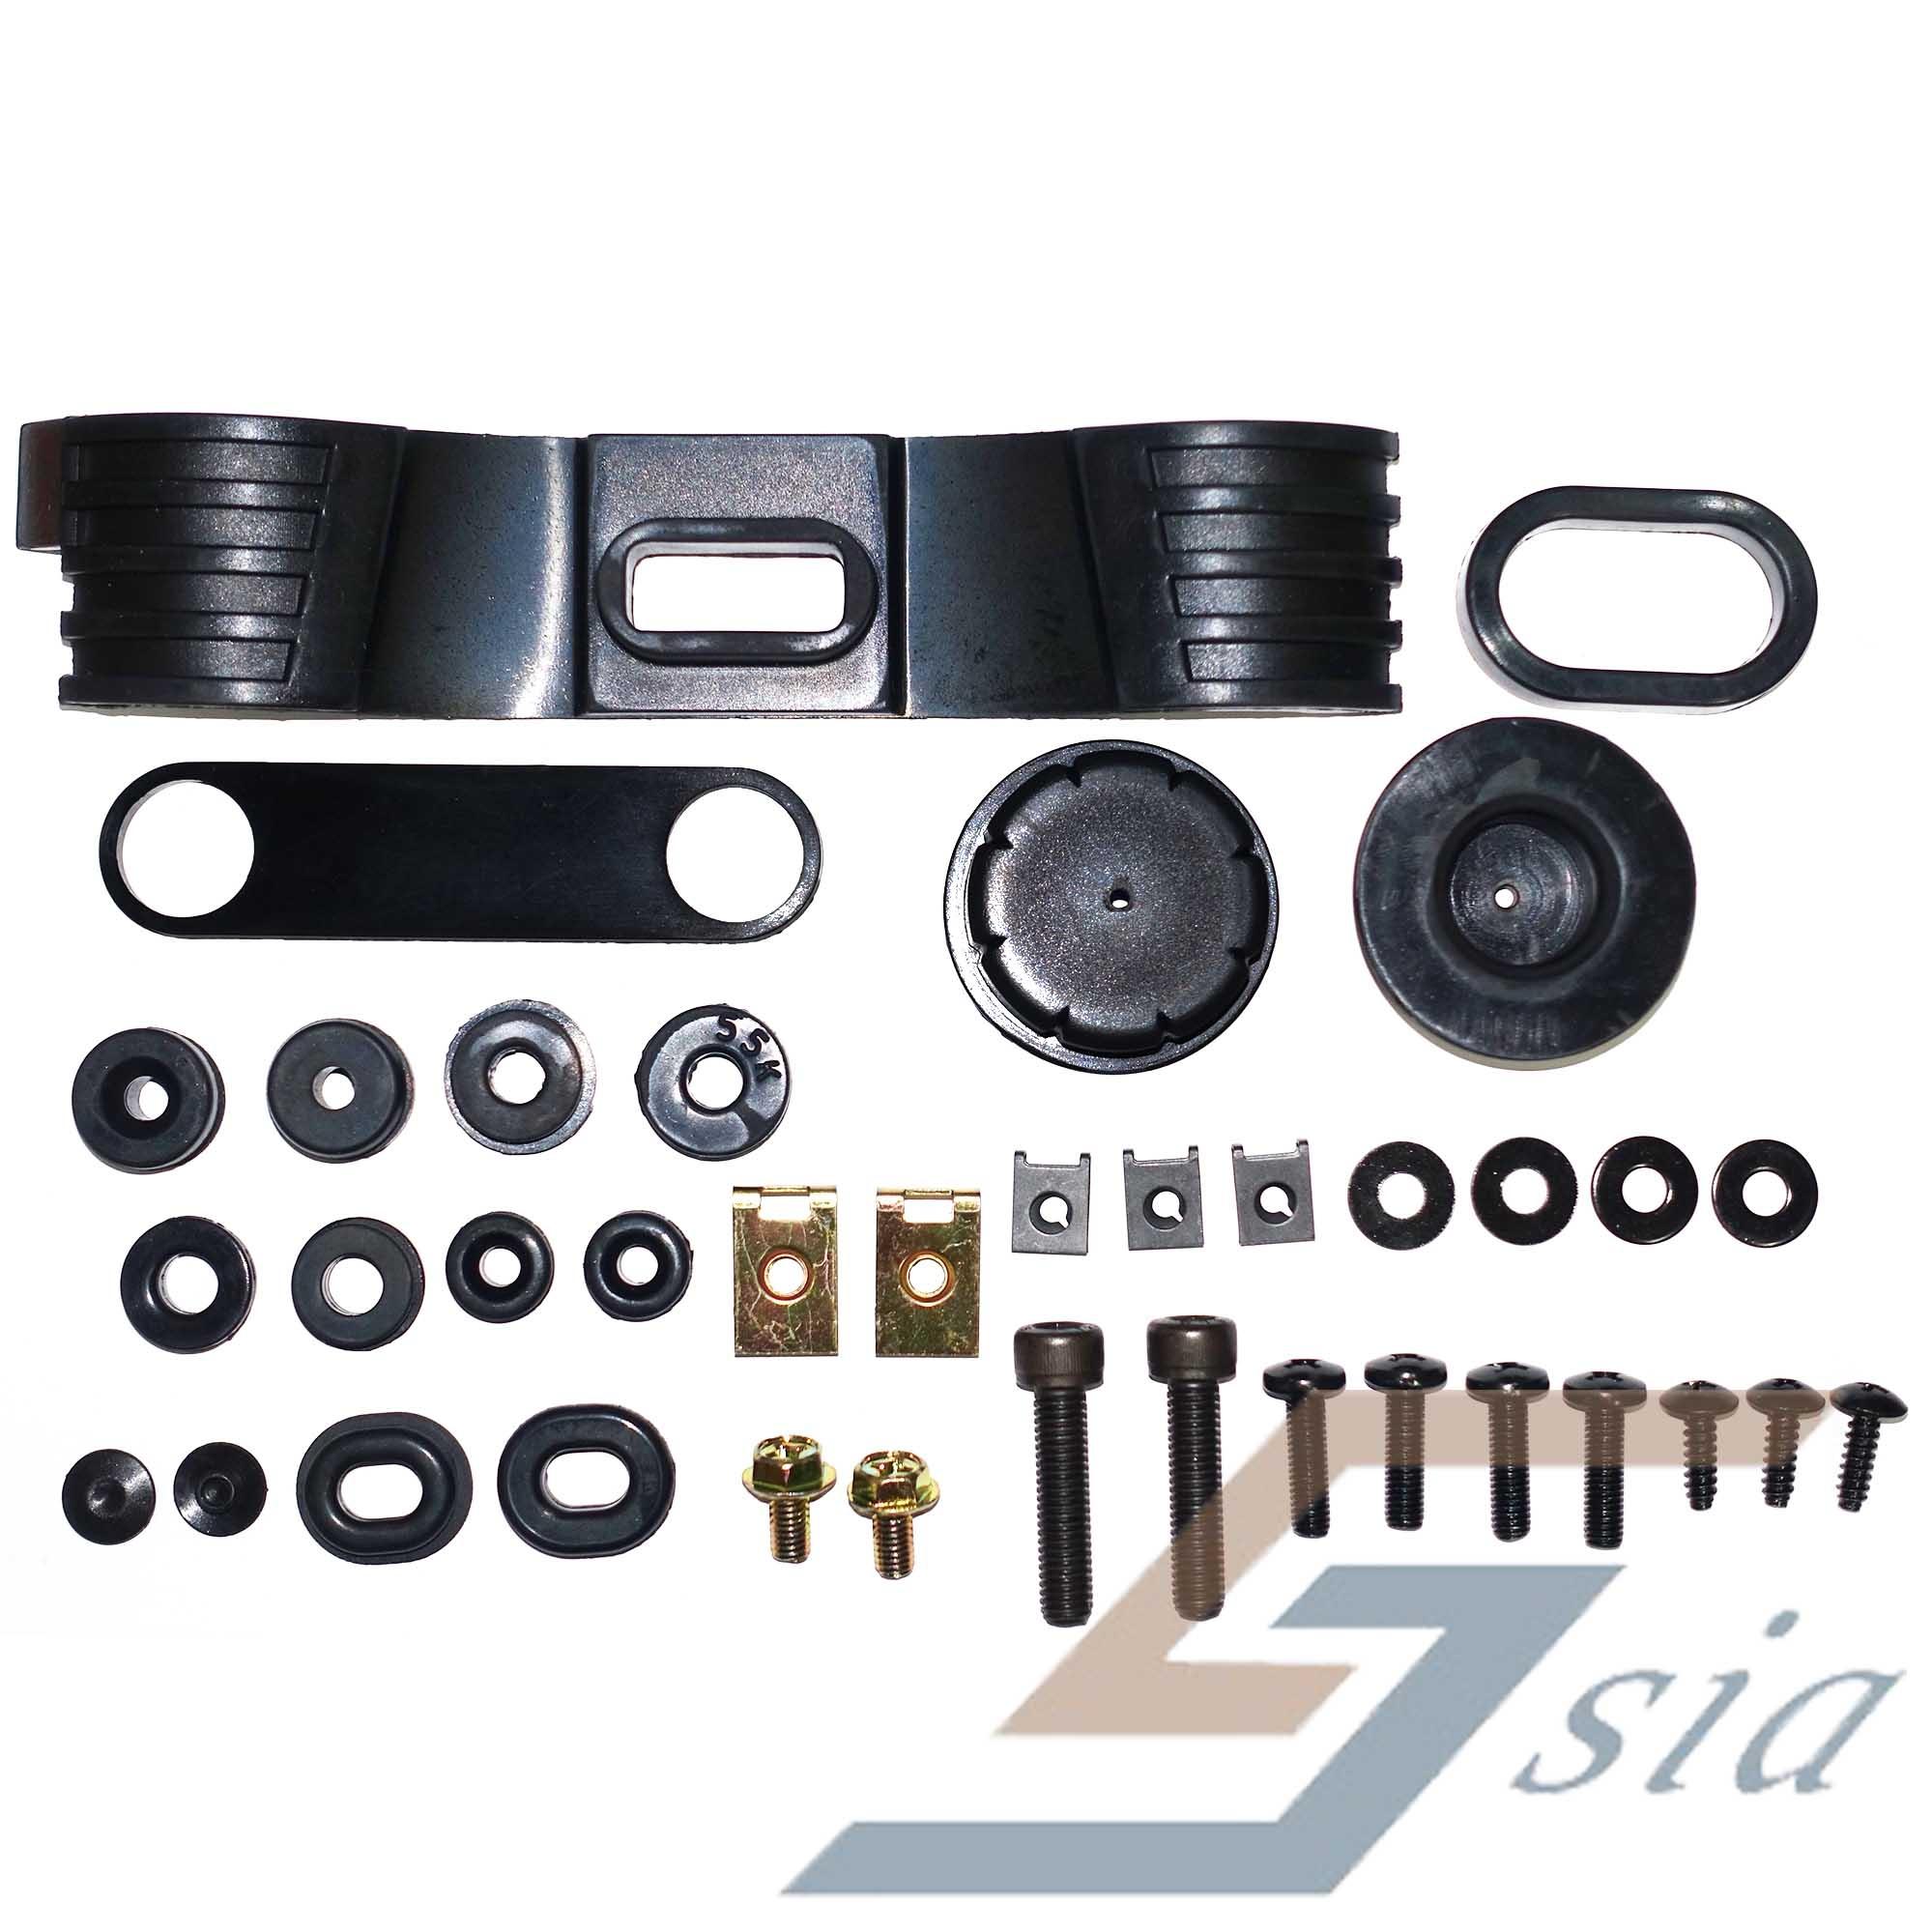 Yamaha Rxz Catalyzer Body Cover Screw Set